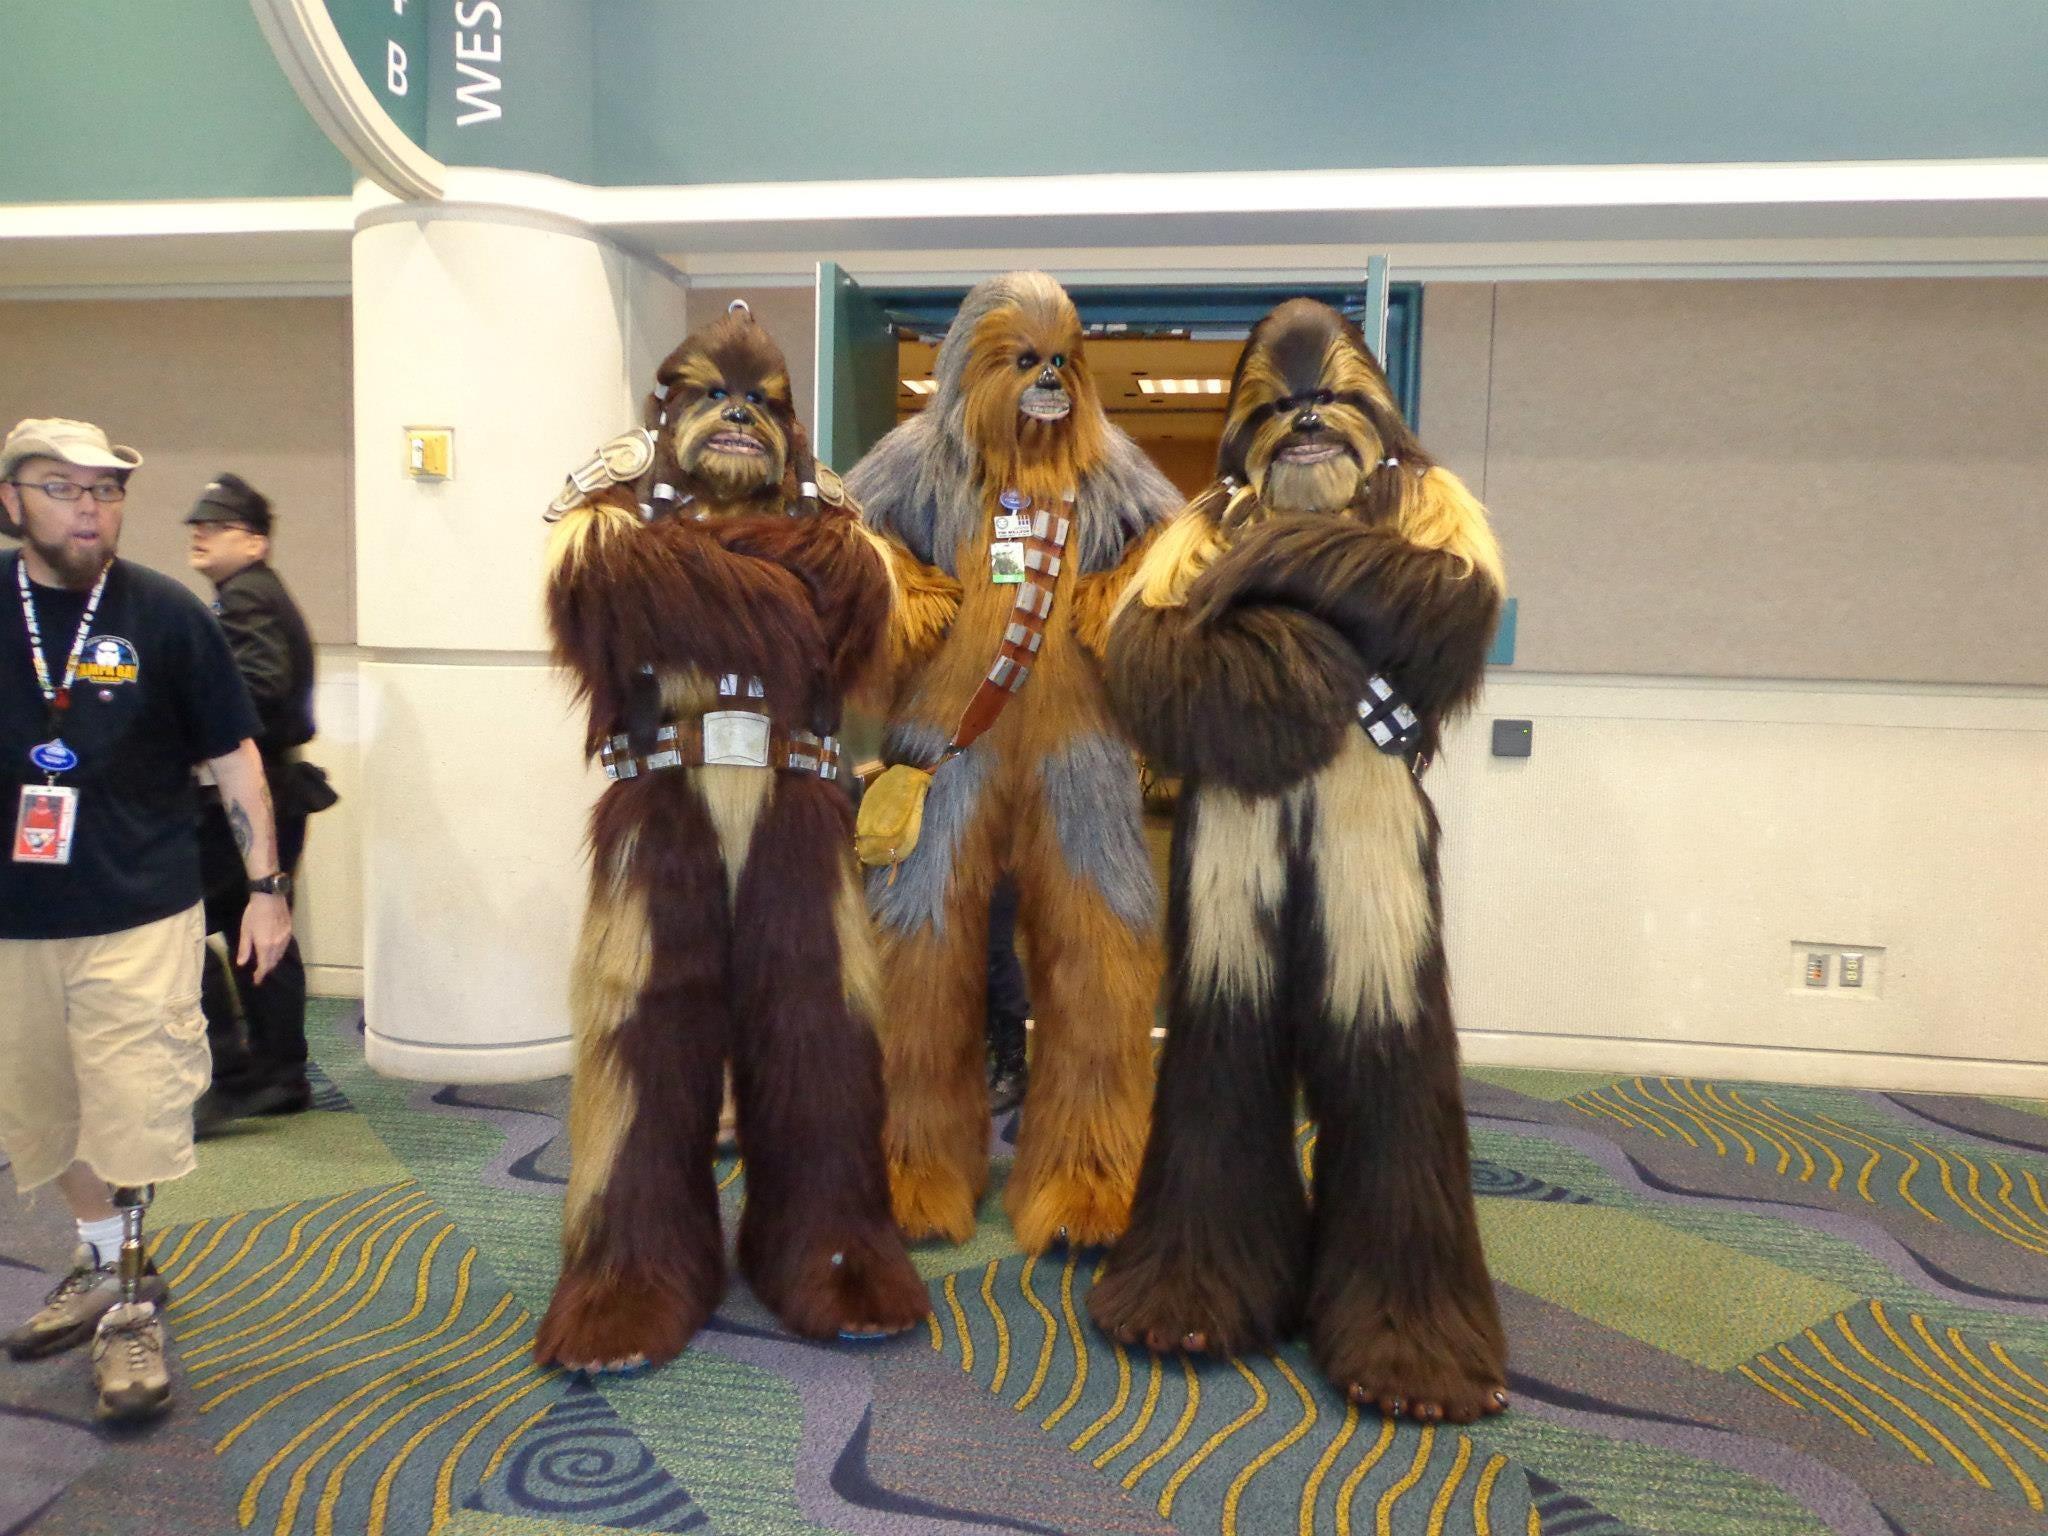 Star Wars Celebration and Isaac